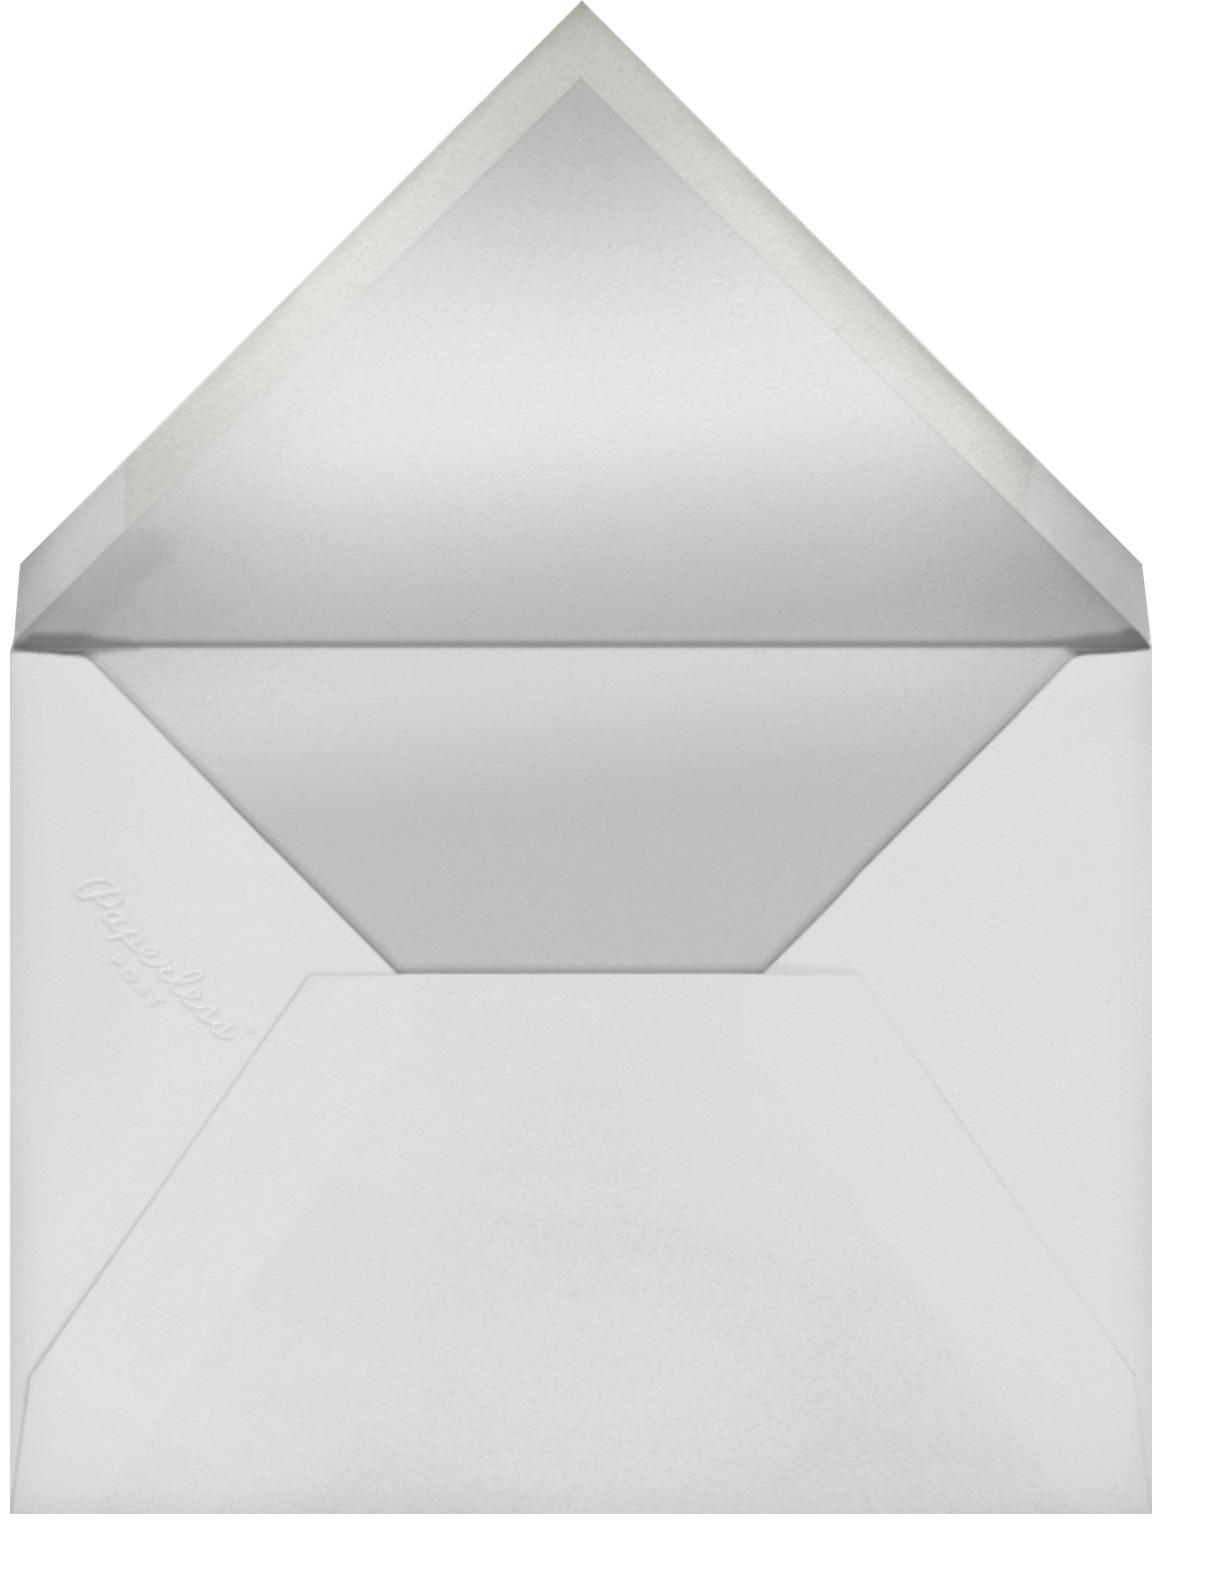 Natural Overprint - Tall - Paperless Post - Book club - envelope back